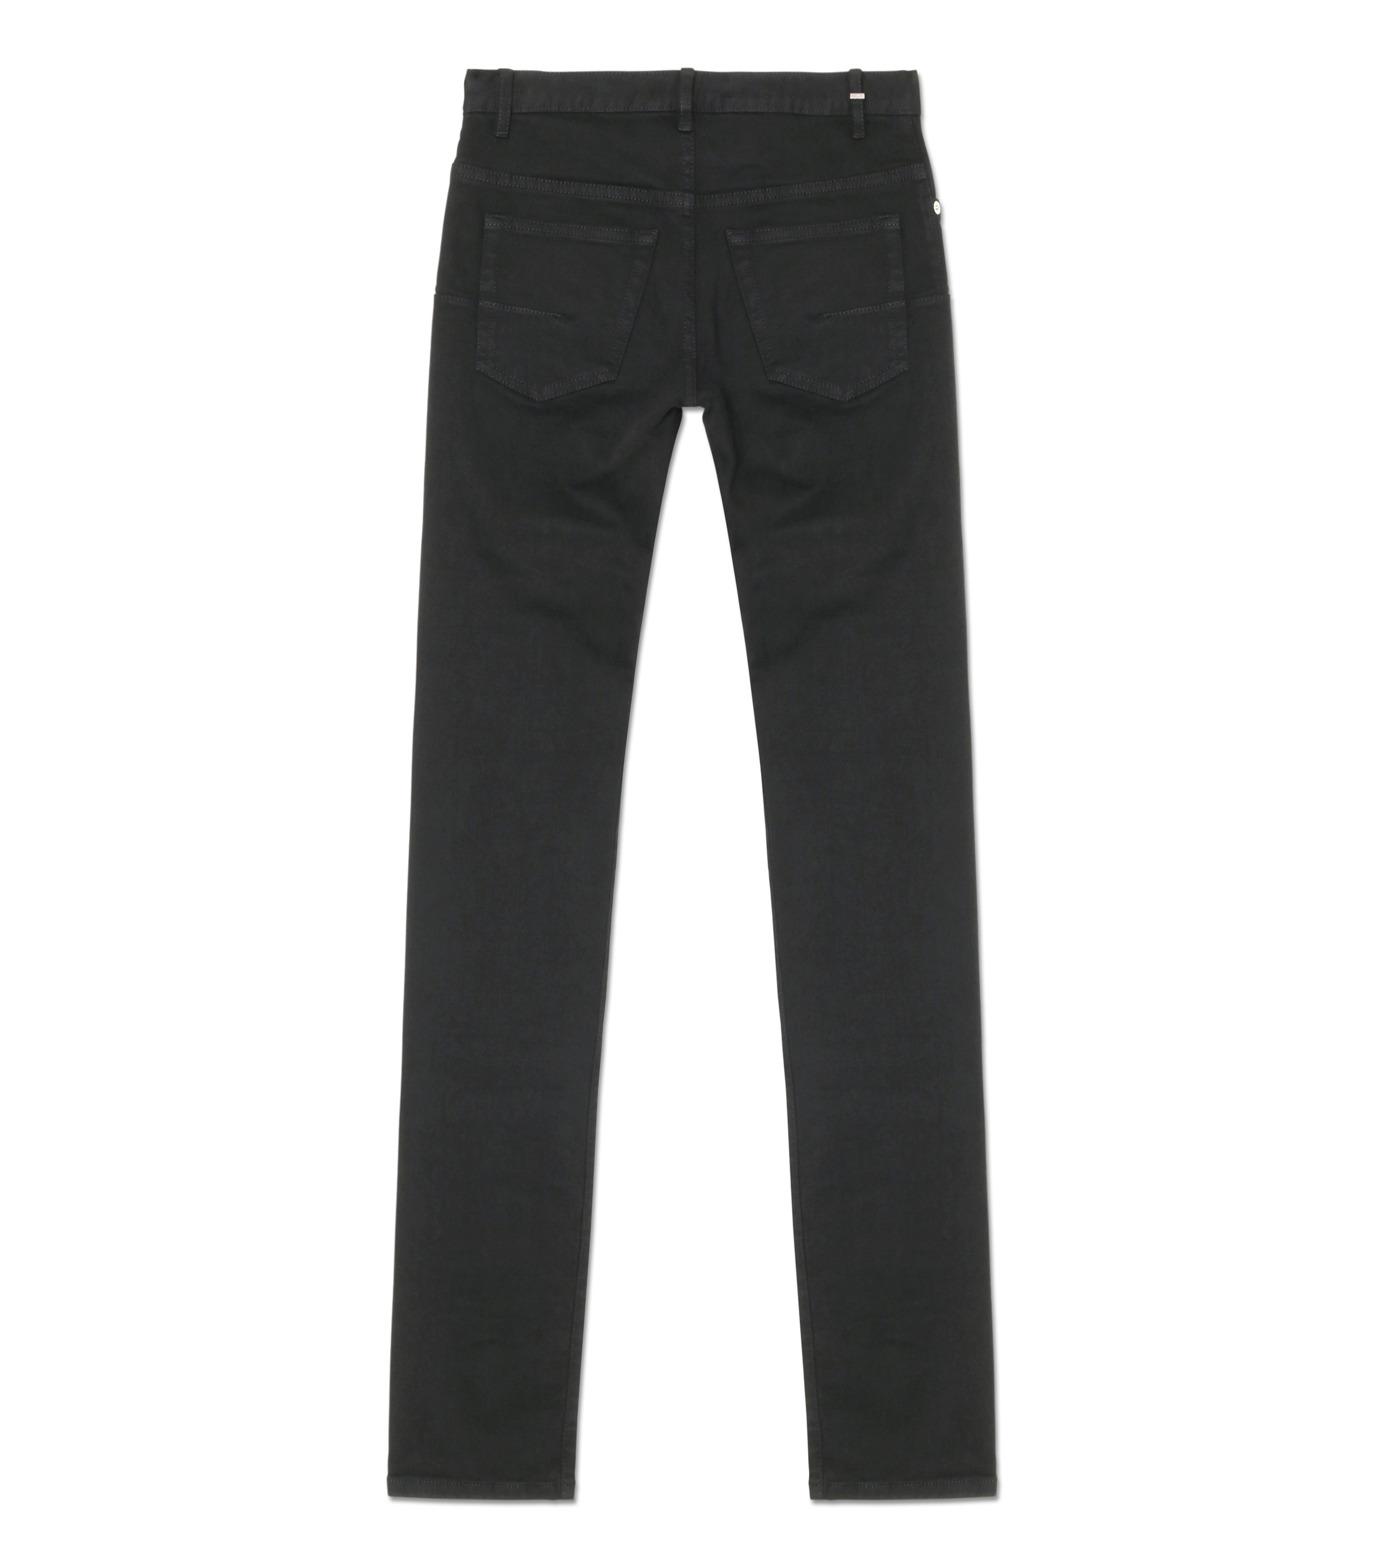 Dior Homme(ディオール オム)のStrech Pants-BLACK(デニム/denim)-633D042Y3838-13 拡大詳細画像2